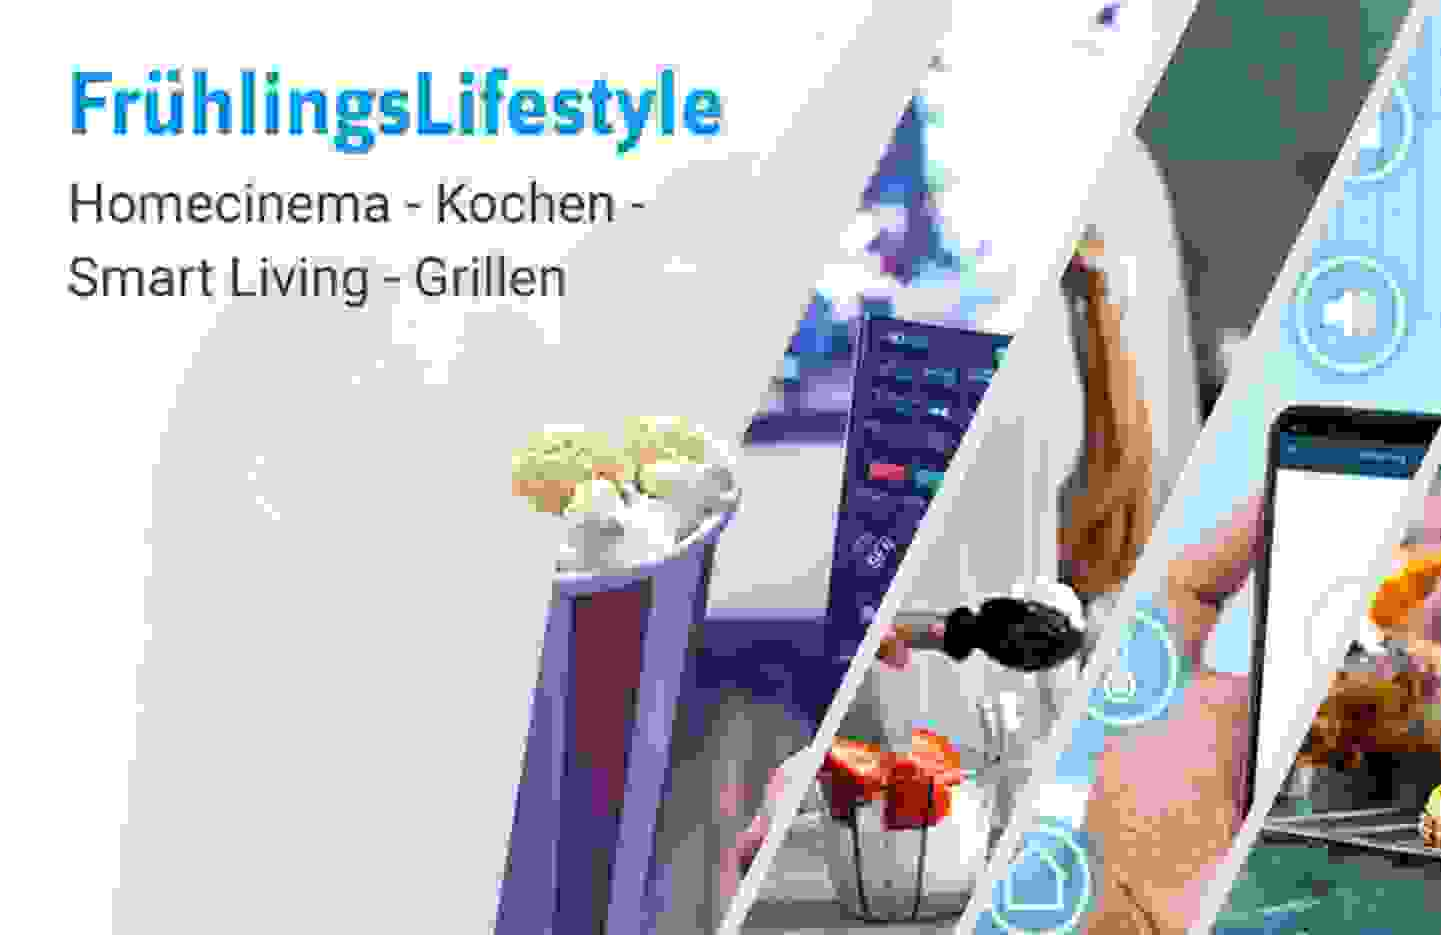 FrühlingsLifestyle - Jetzt mehr erfahren »